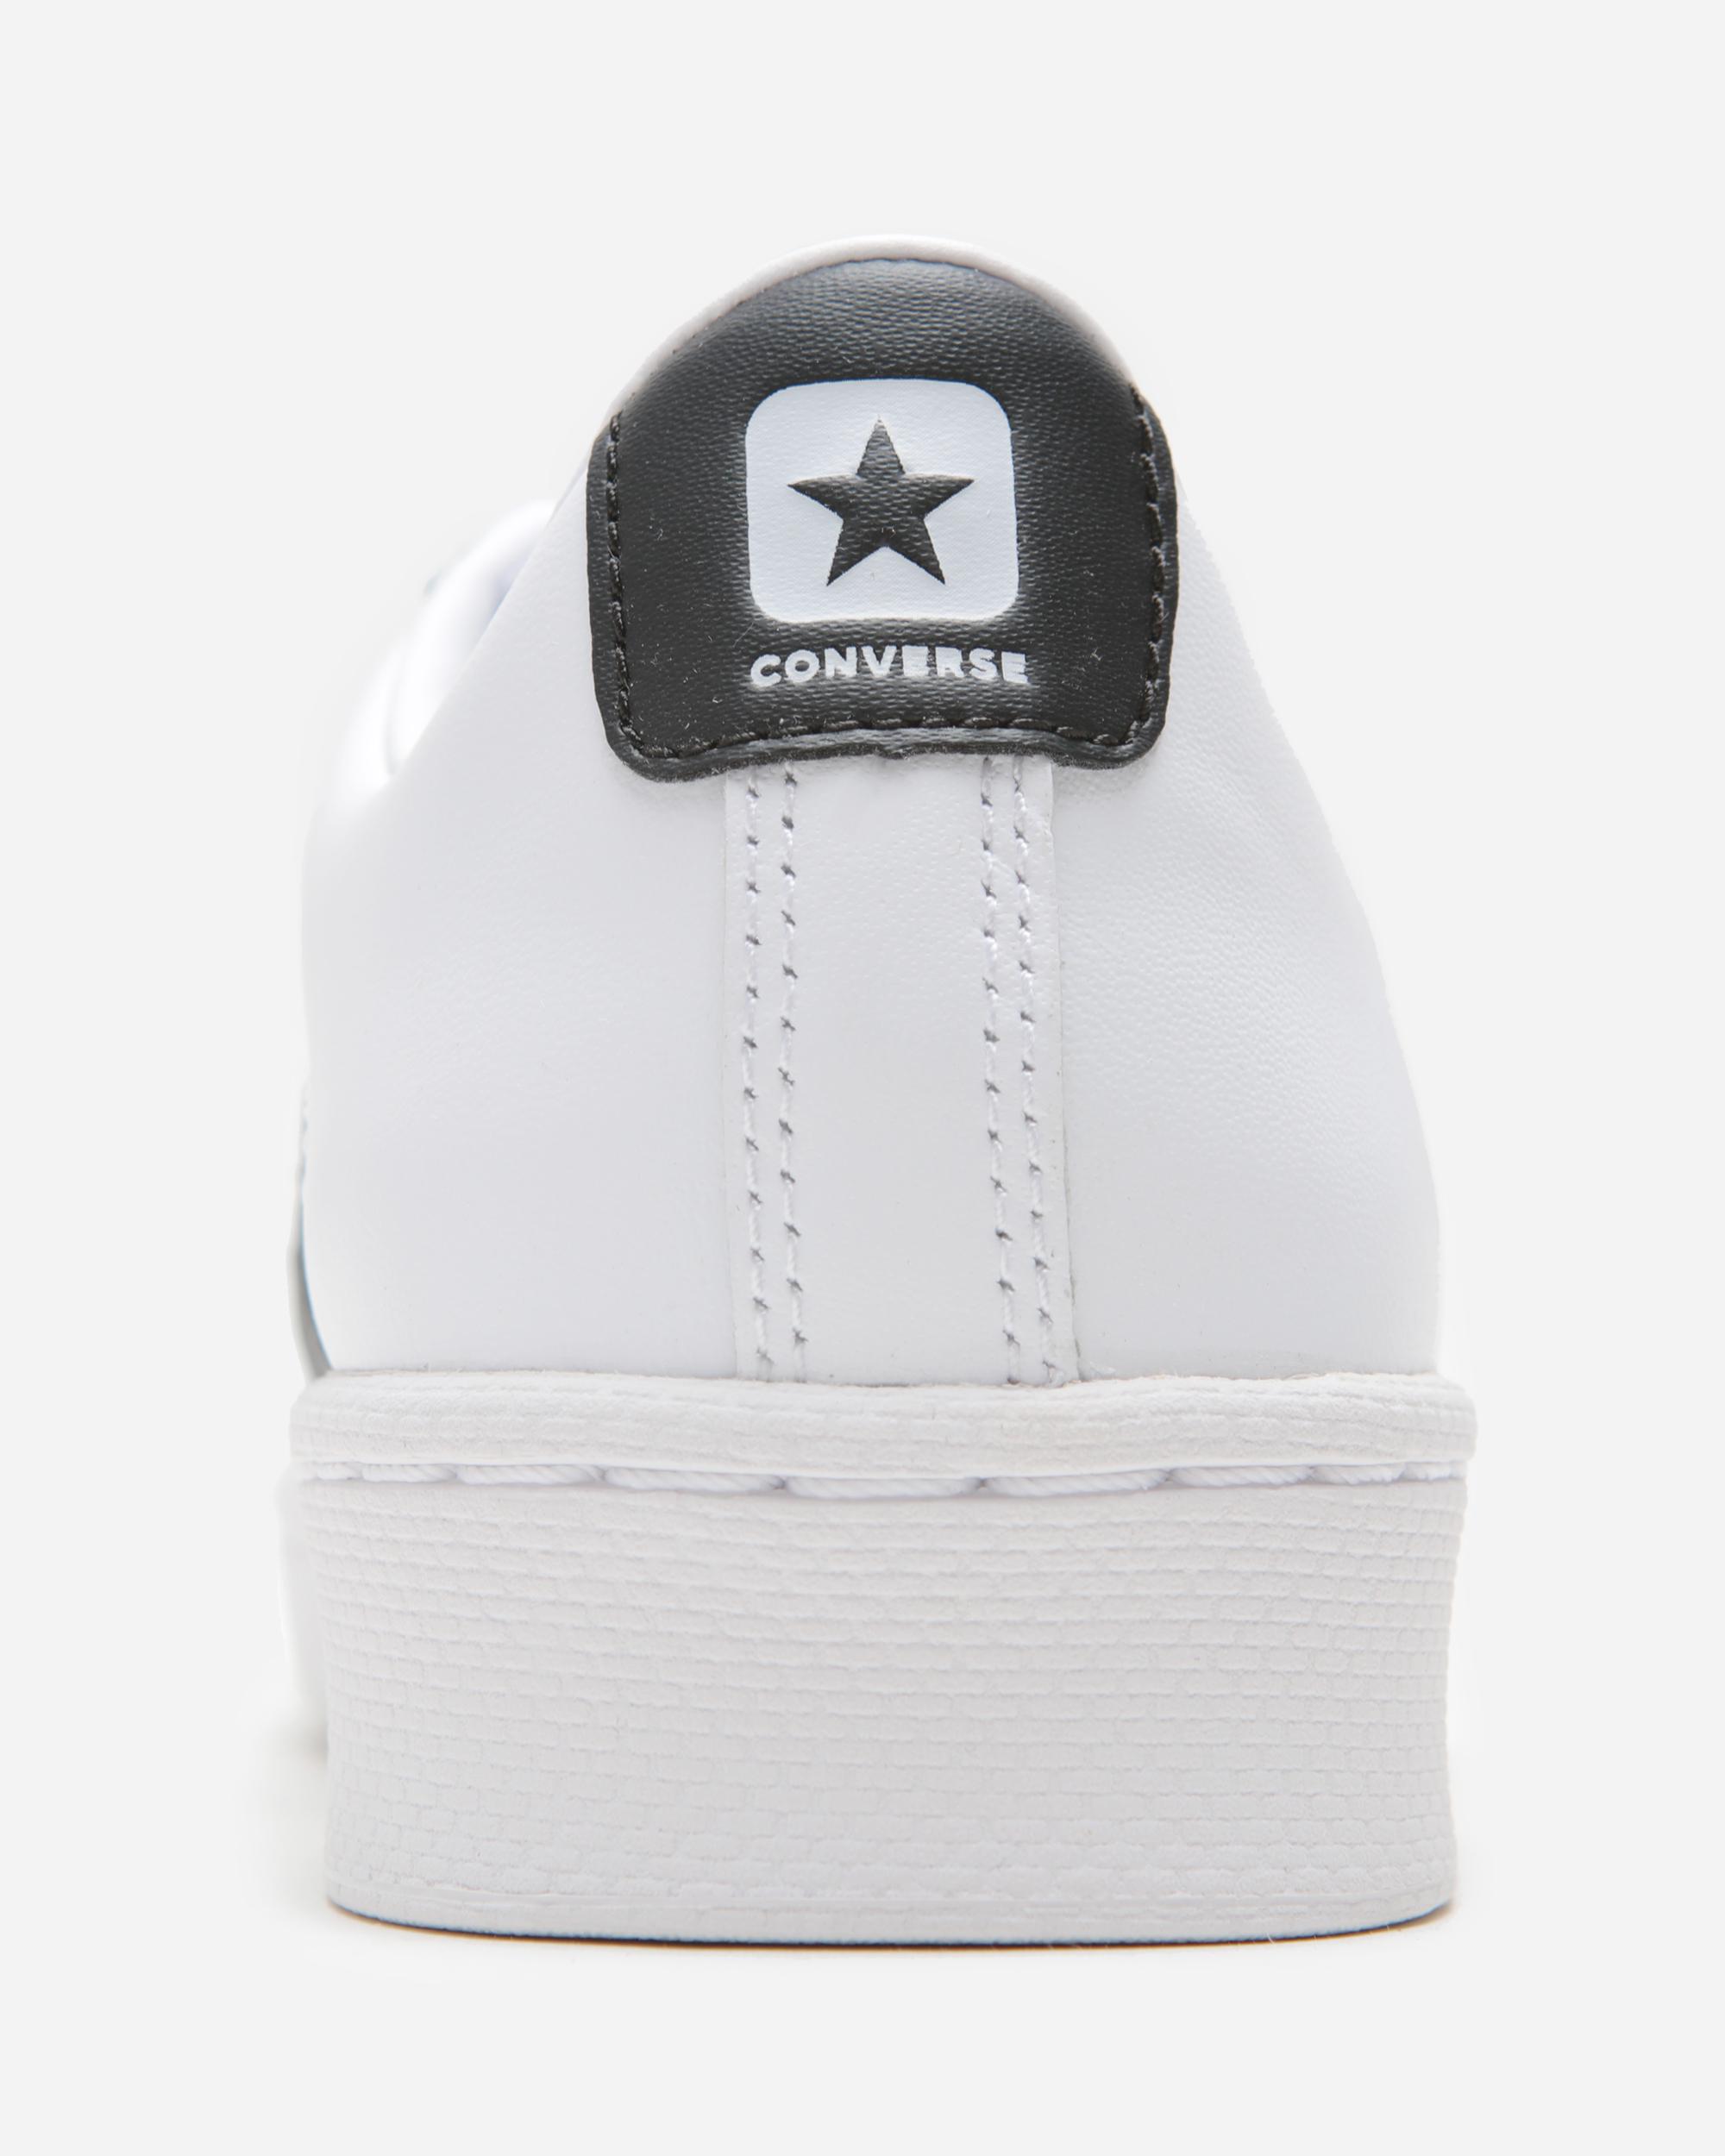 CONVERSE NET STAR CLASSIC OX BLACK/BLACK/WHITE 170715C